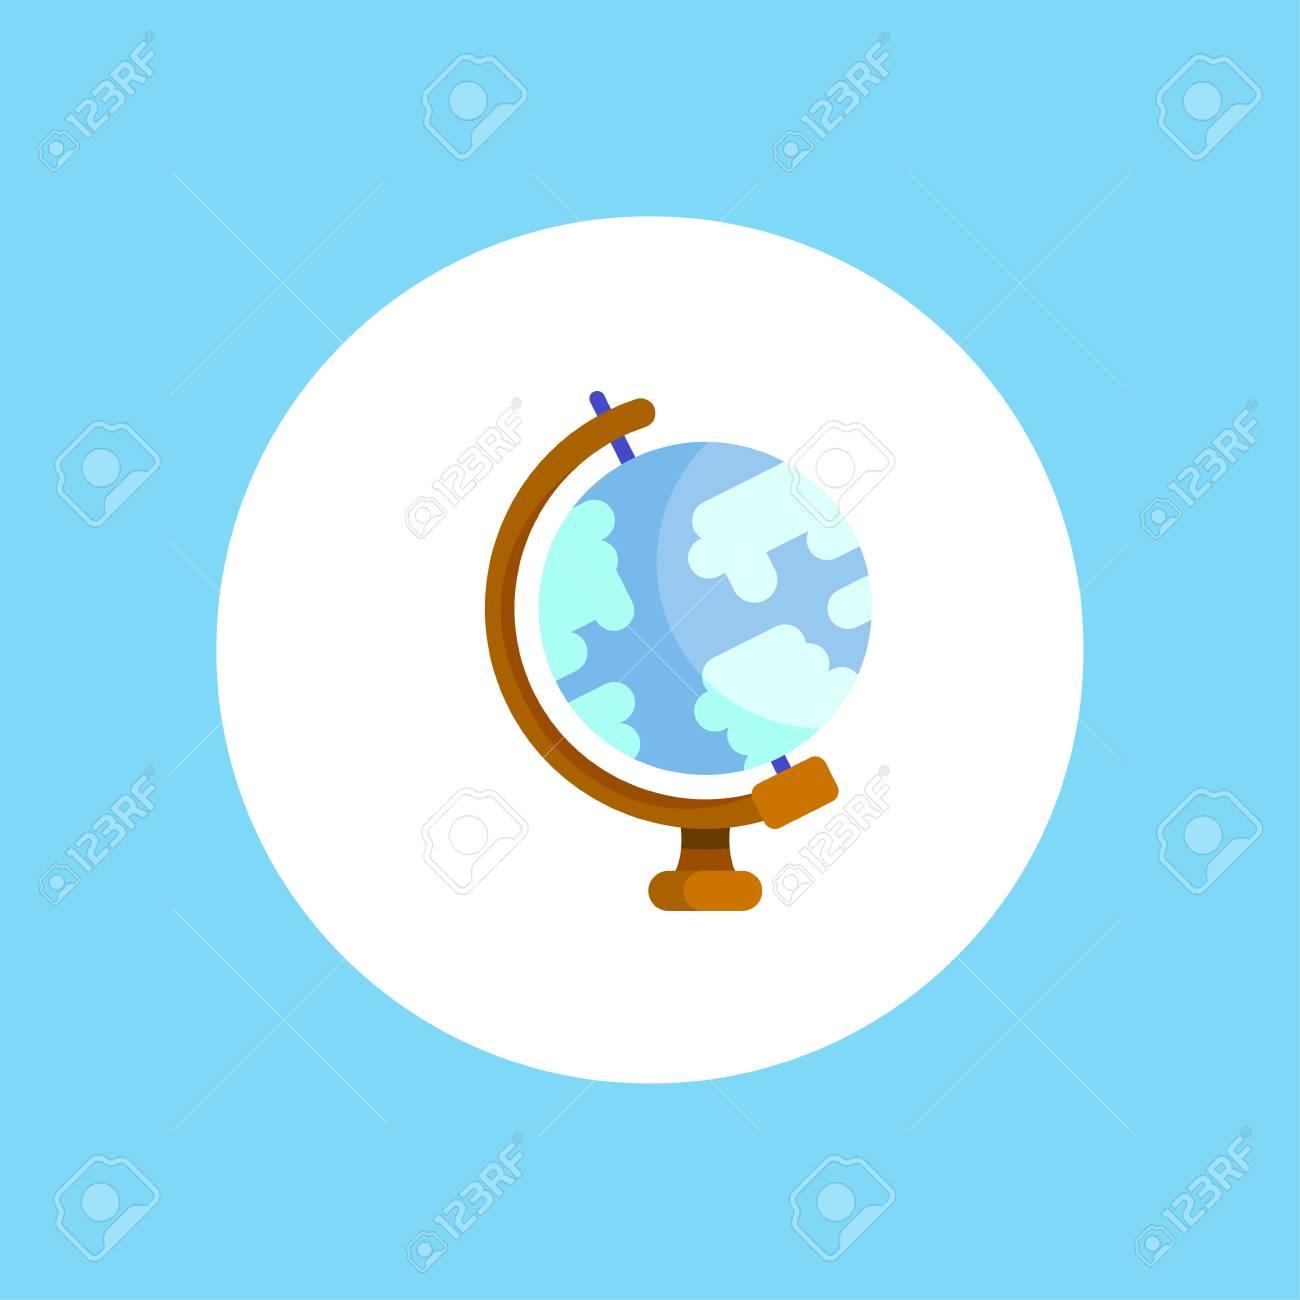 Round Globe Map.Globe World Map Vector Icon Round Earth Flat Vector Illustration